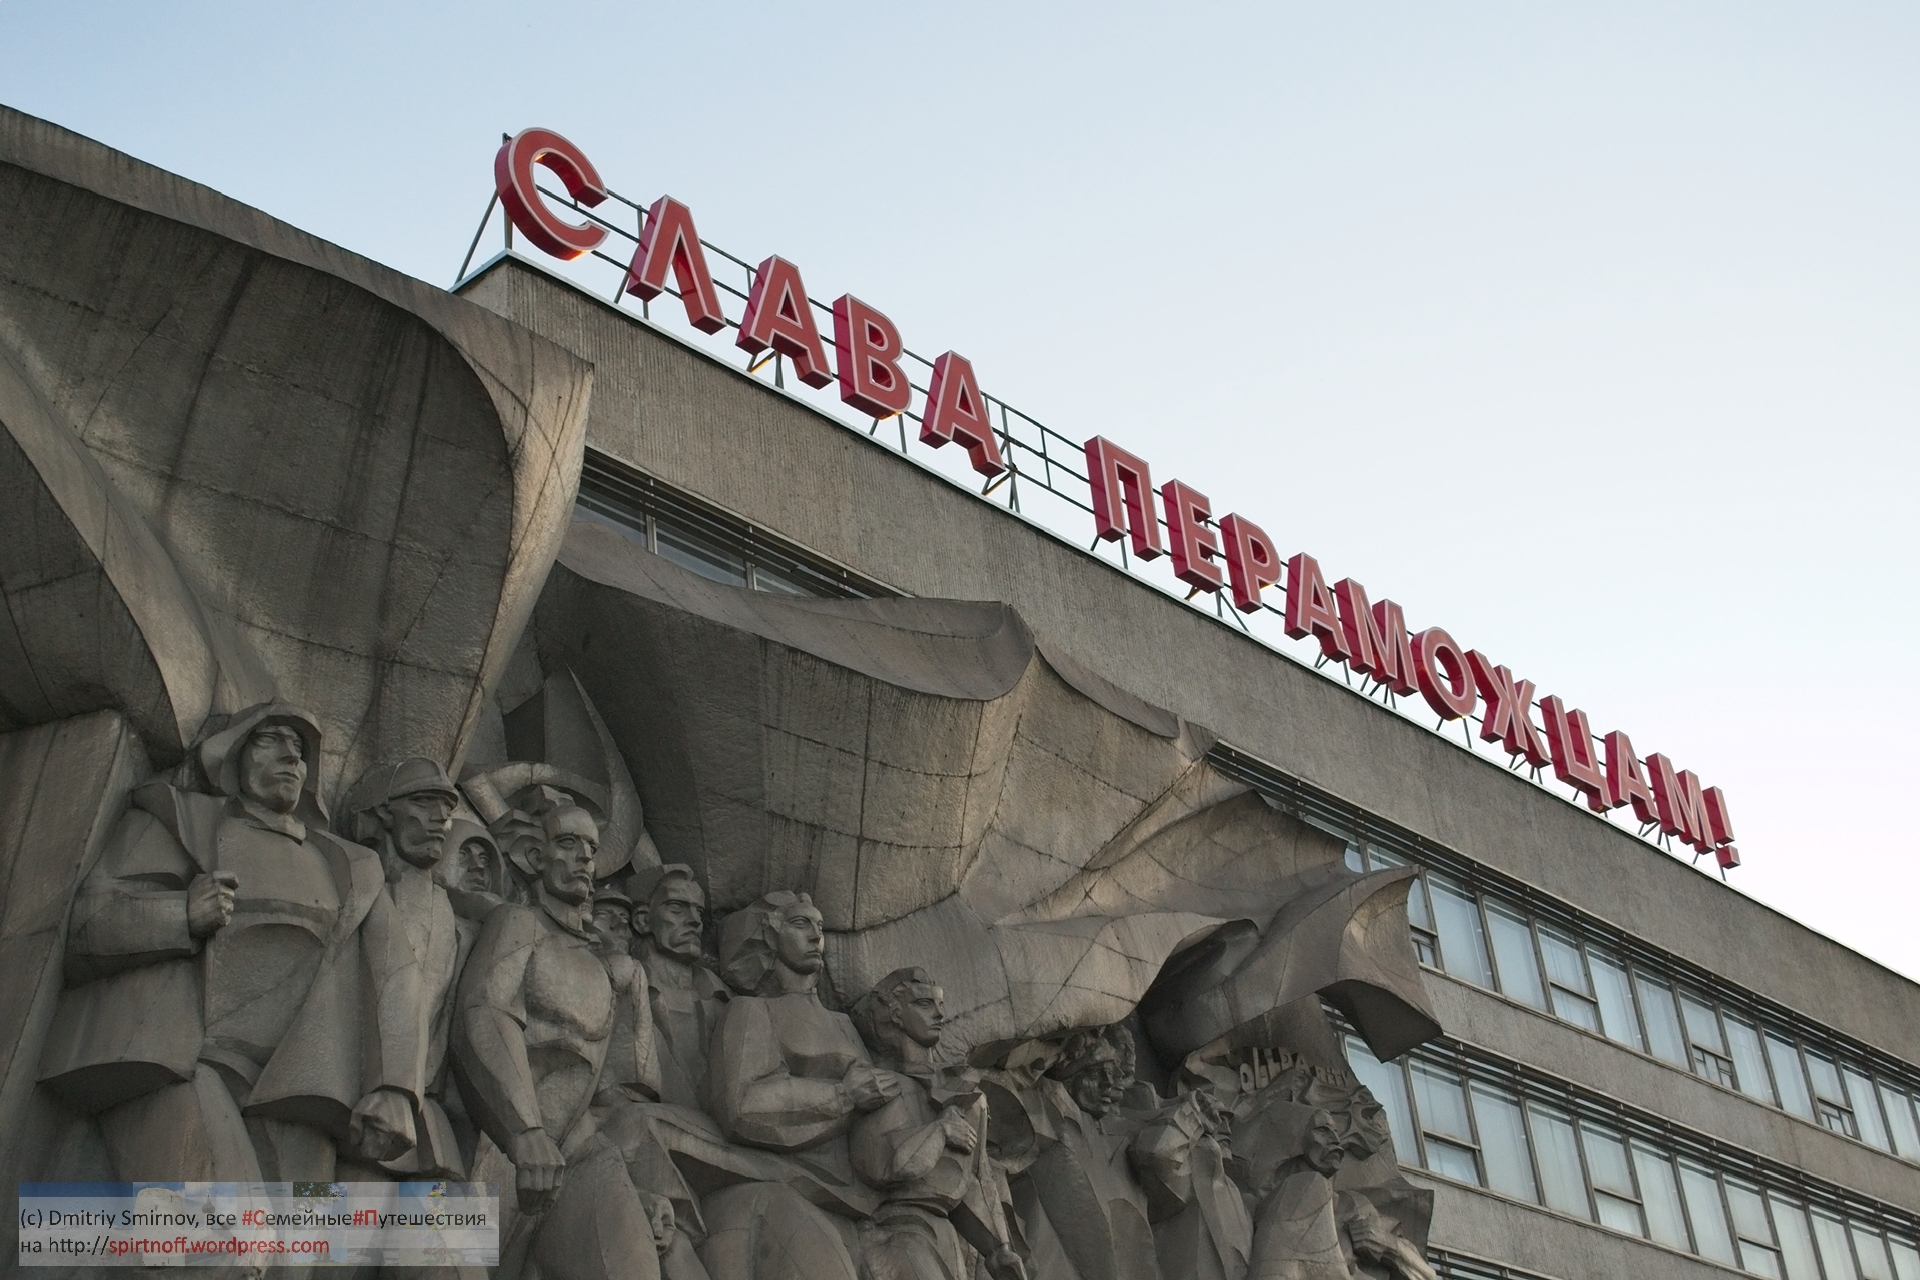 DSC_7224-15-Blog-36 Путешествия  Минск. Мечеть. Яма.